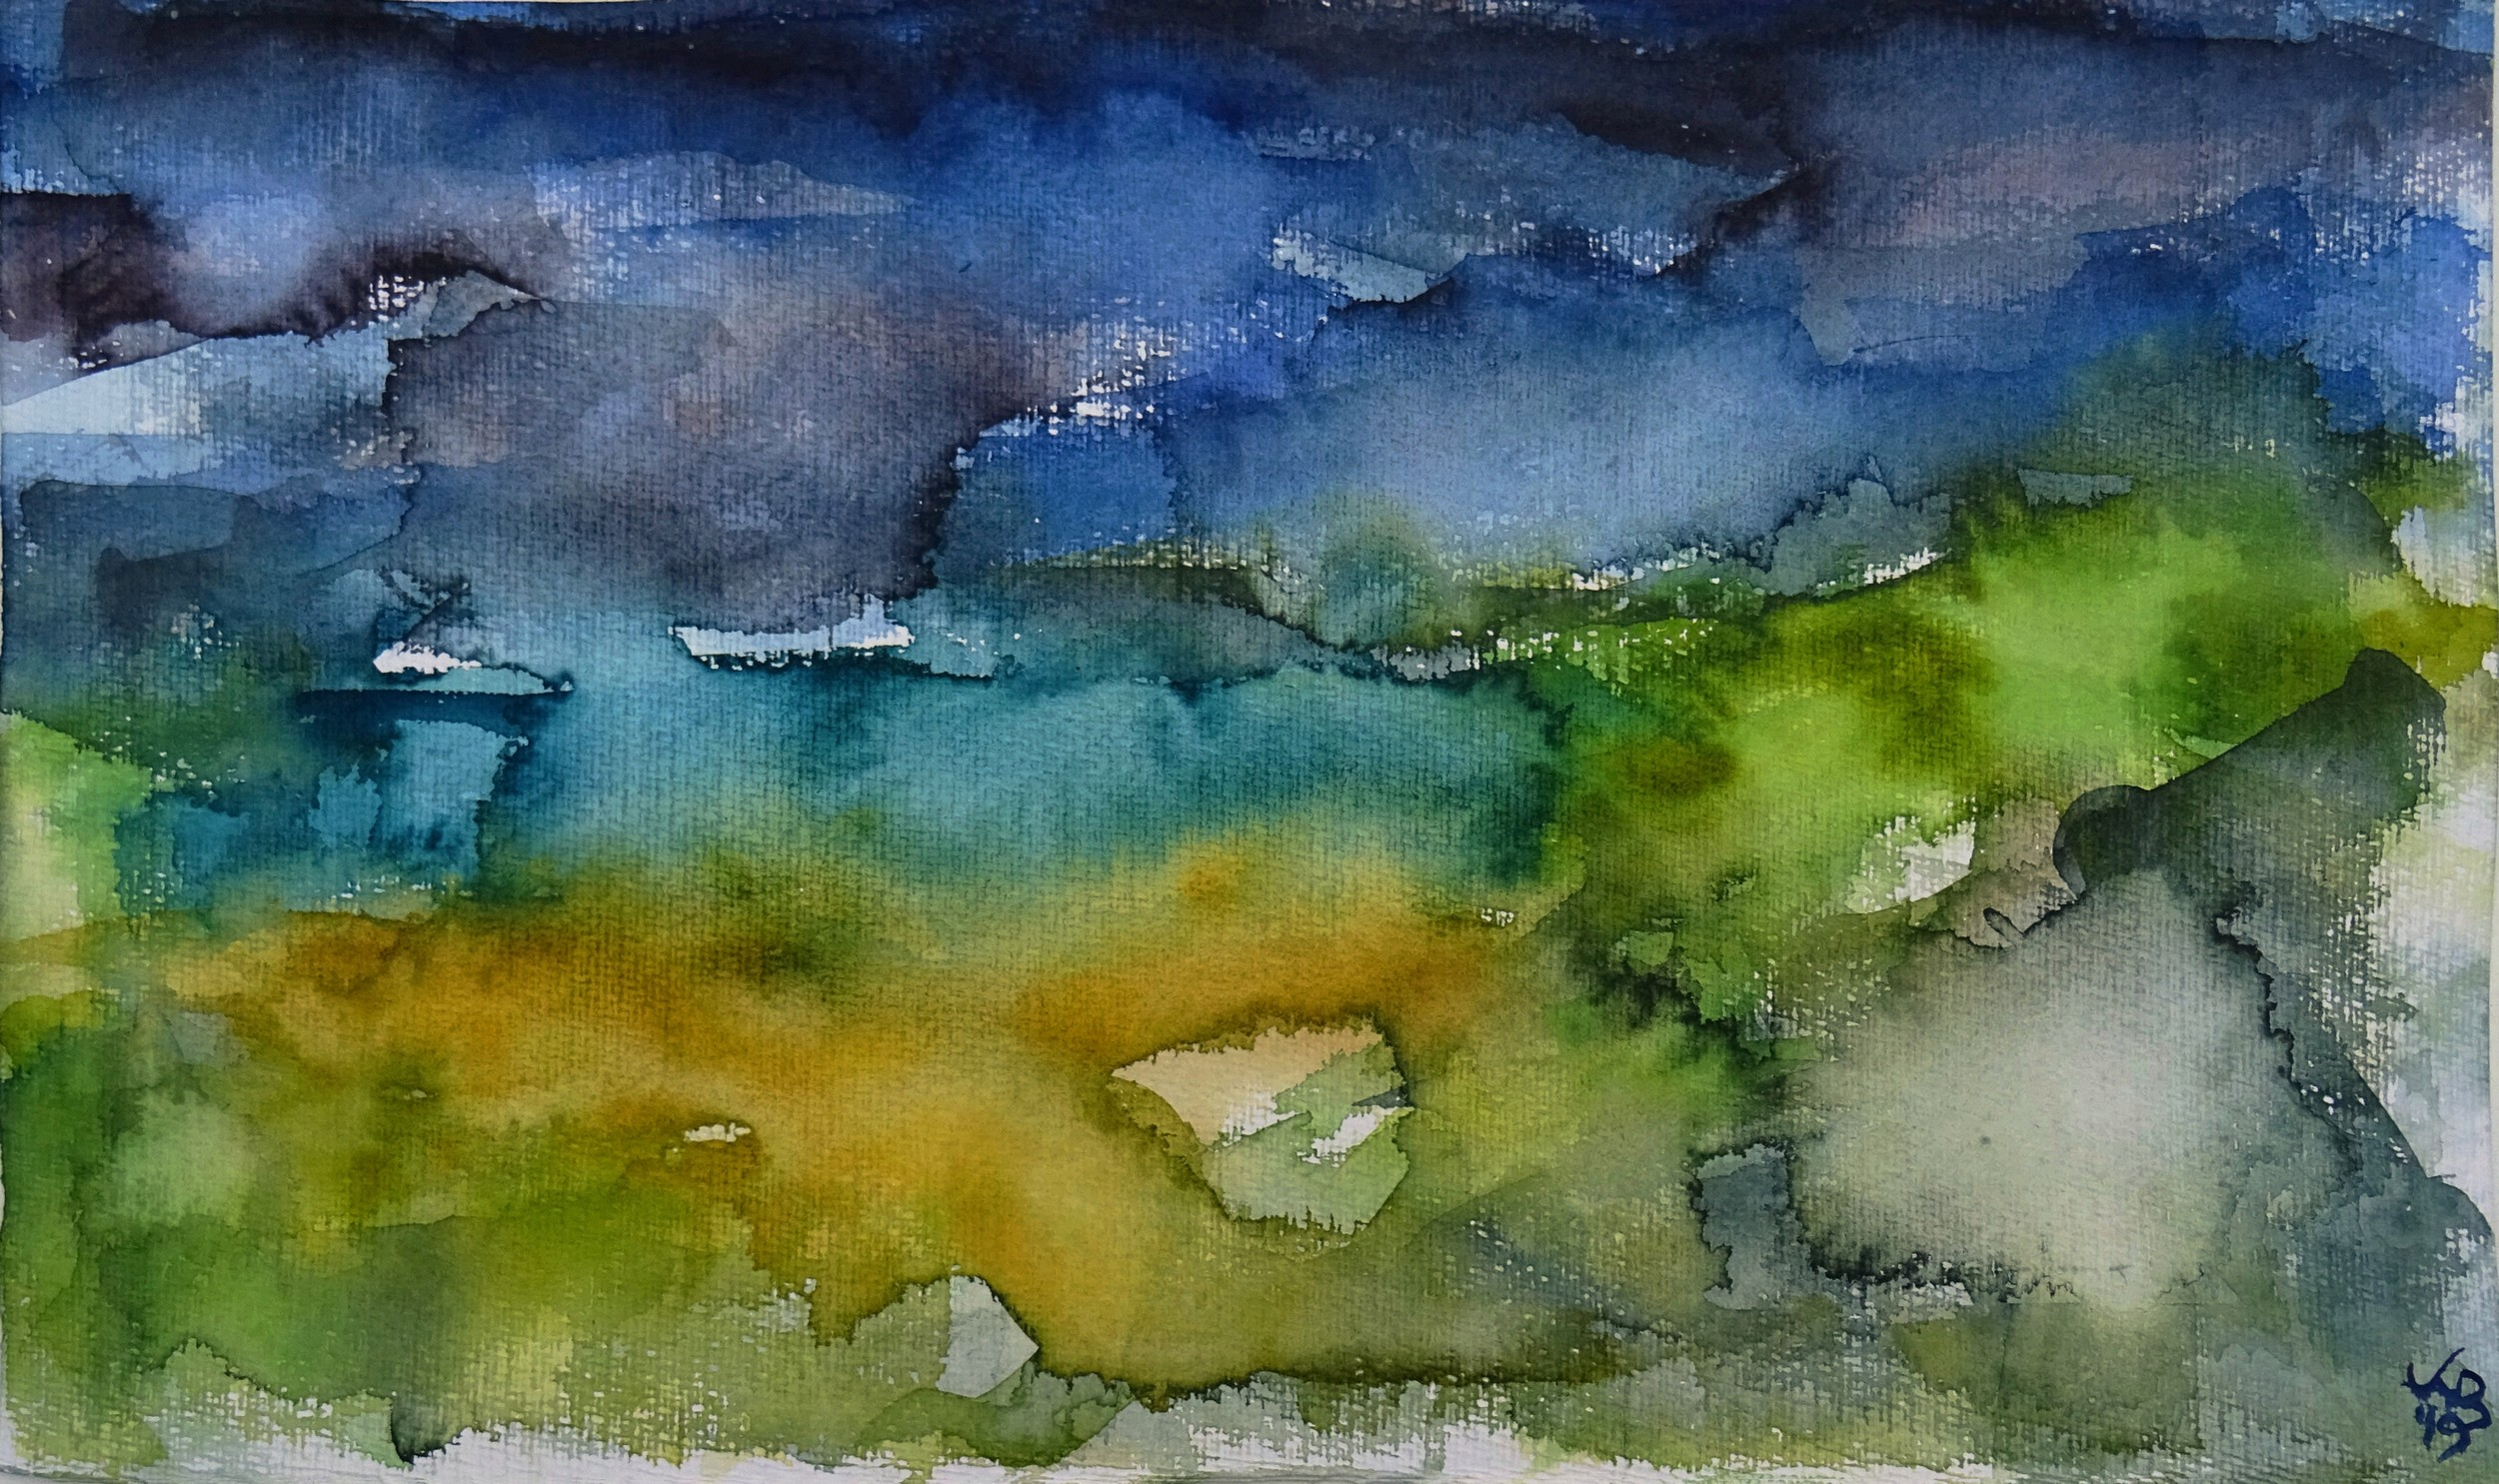 19-01-26_outer_hebrides_great_benera_bostadh_beach_Watercolour_50_x_30_cm_©2019_by_Klaus_Bölling.jpg